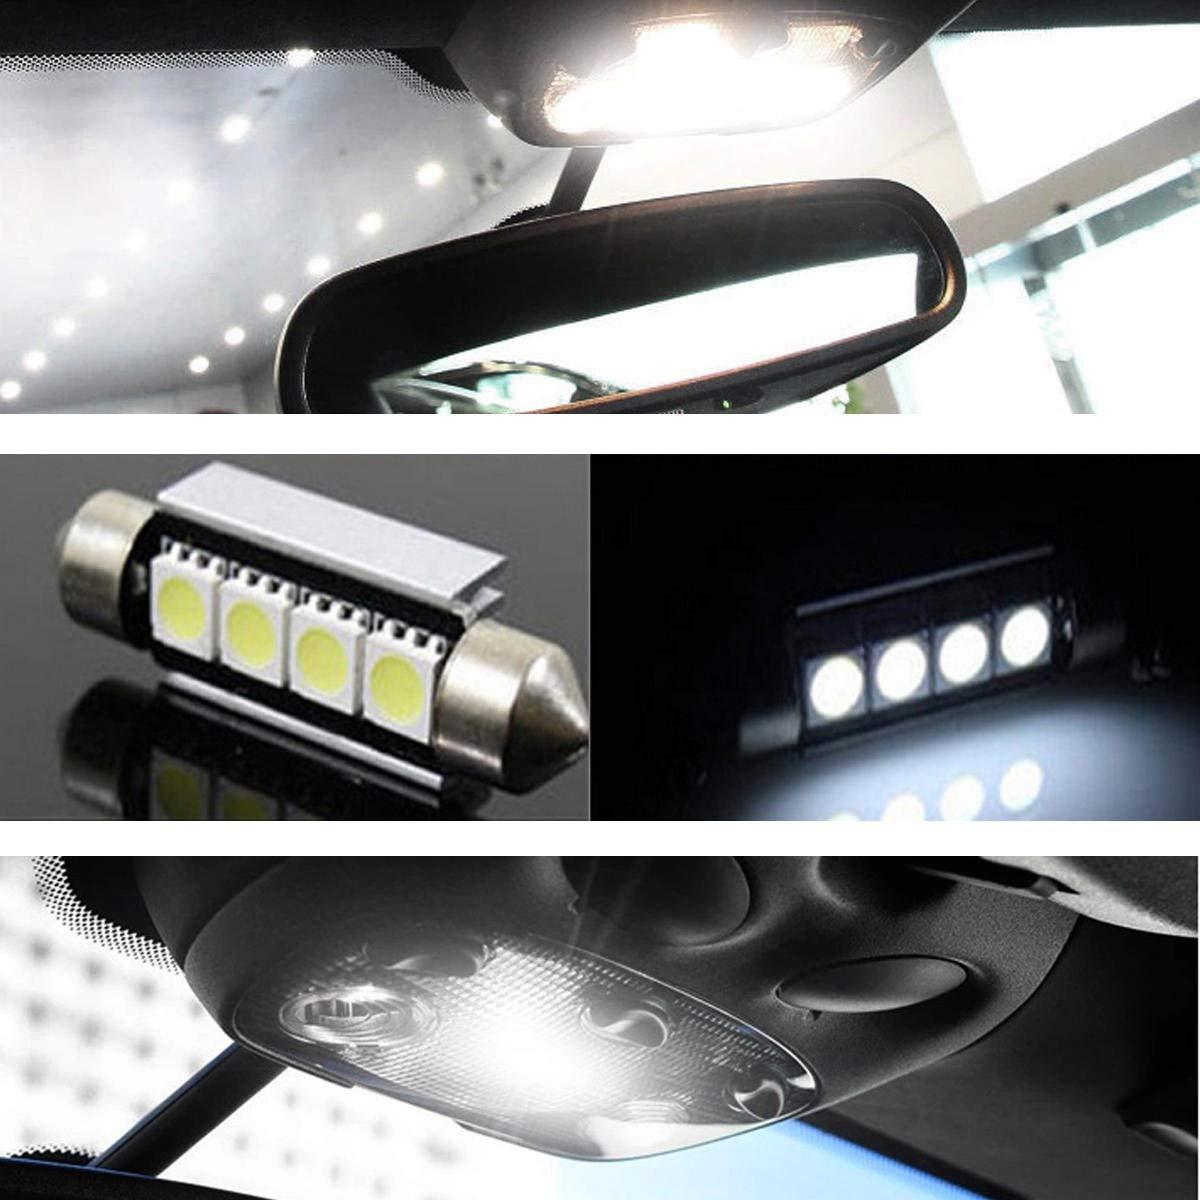 20PCS Interior LED Festoon Dome Lights Kit 6000K White Canbus FREE for Audi A4 S4 B8 Avant 2009-2015